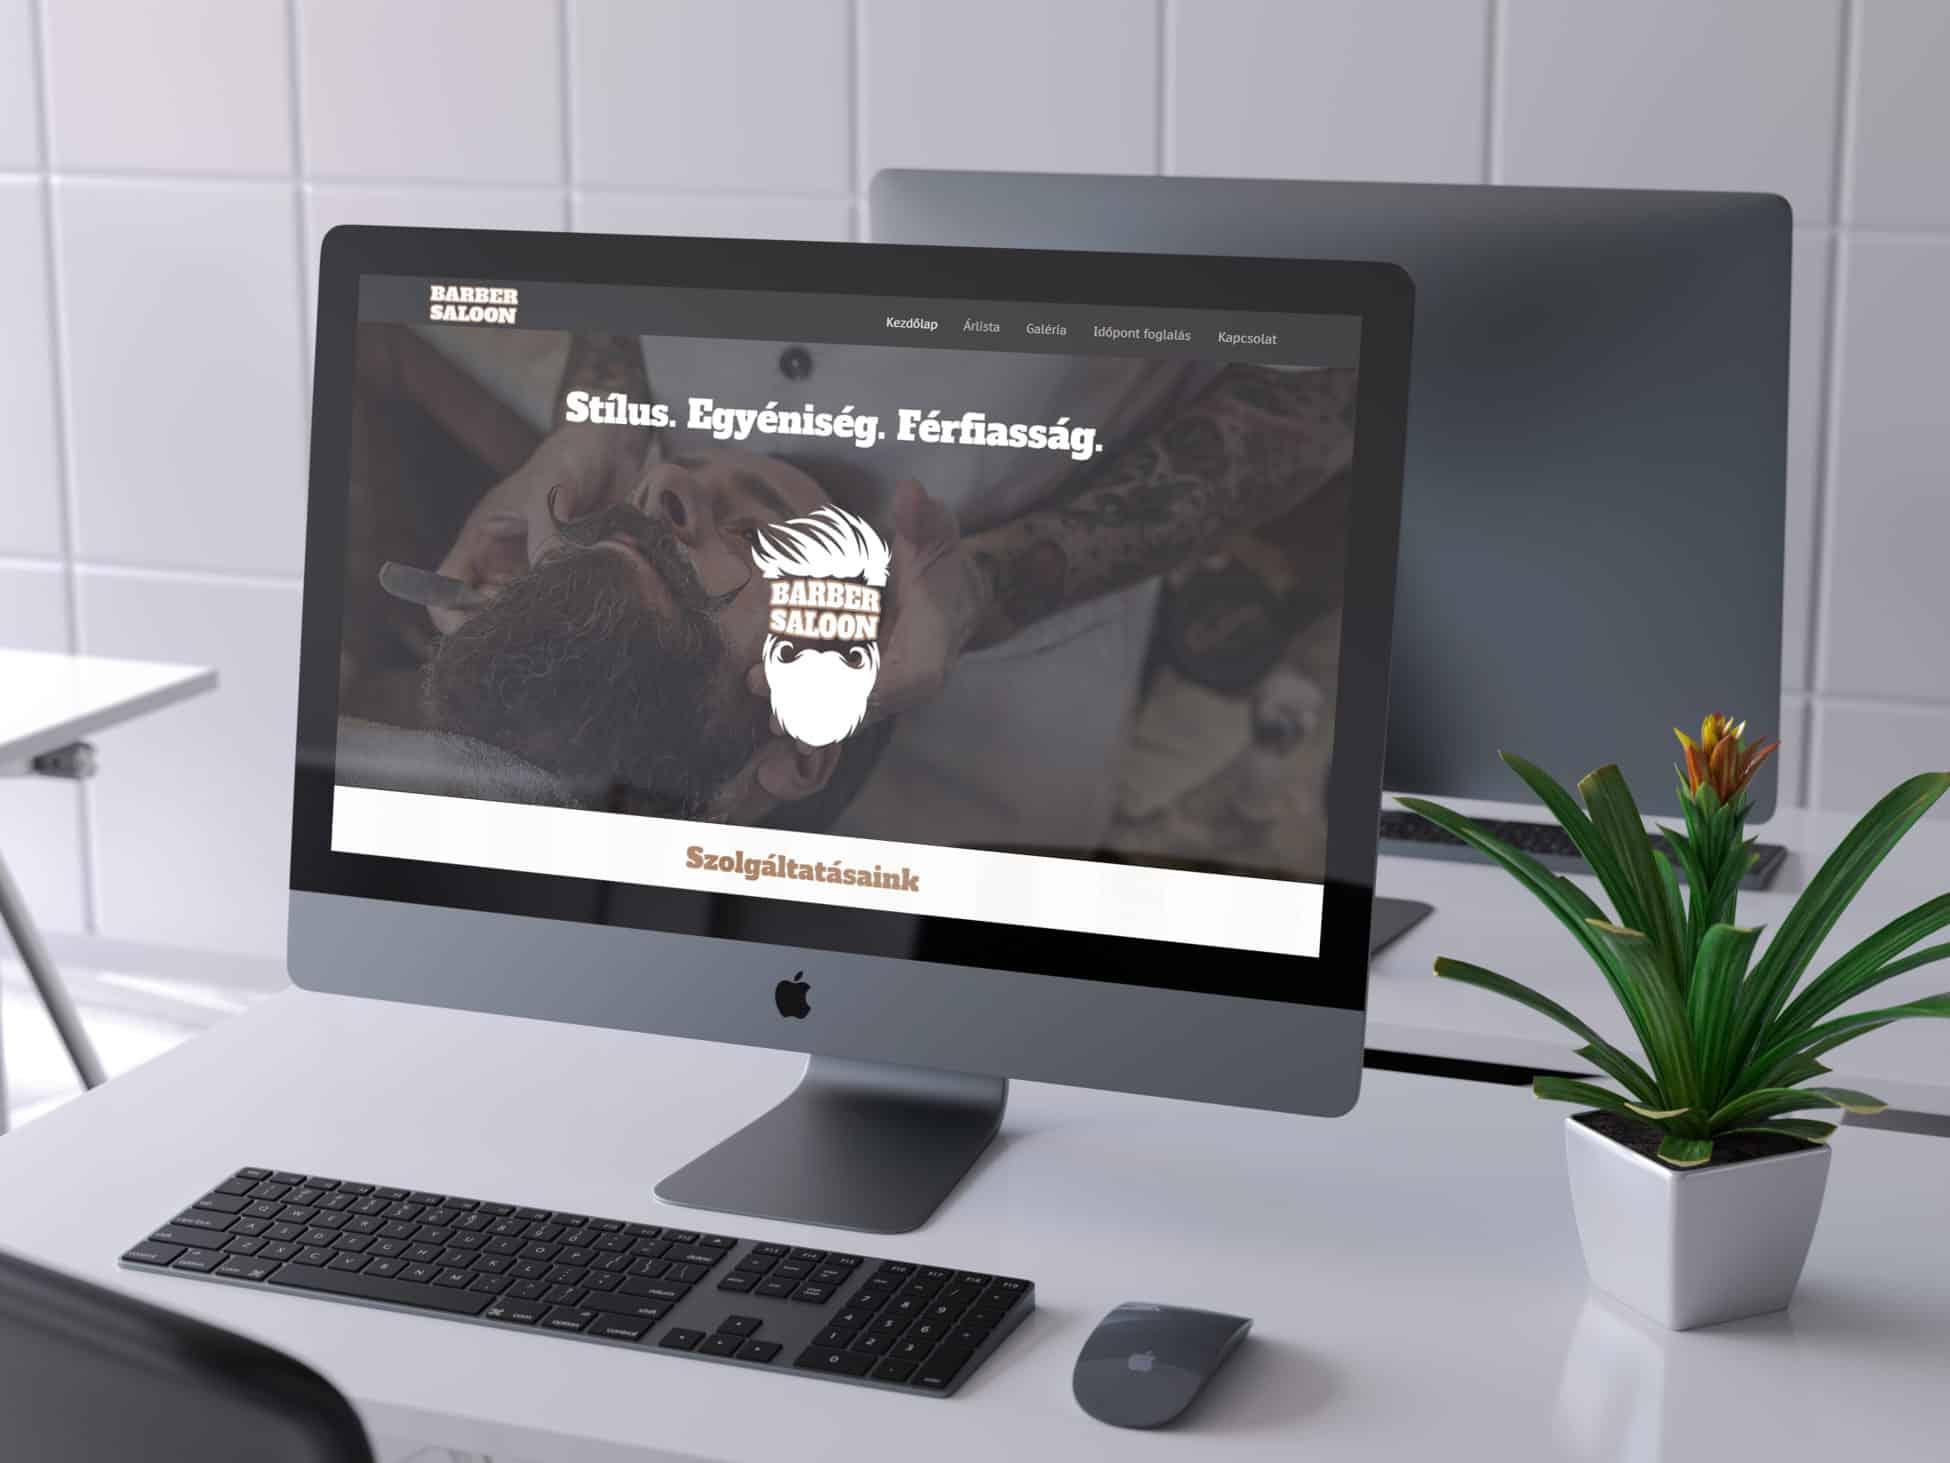 Barber Saloon weboldal